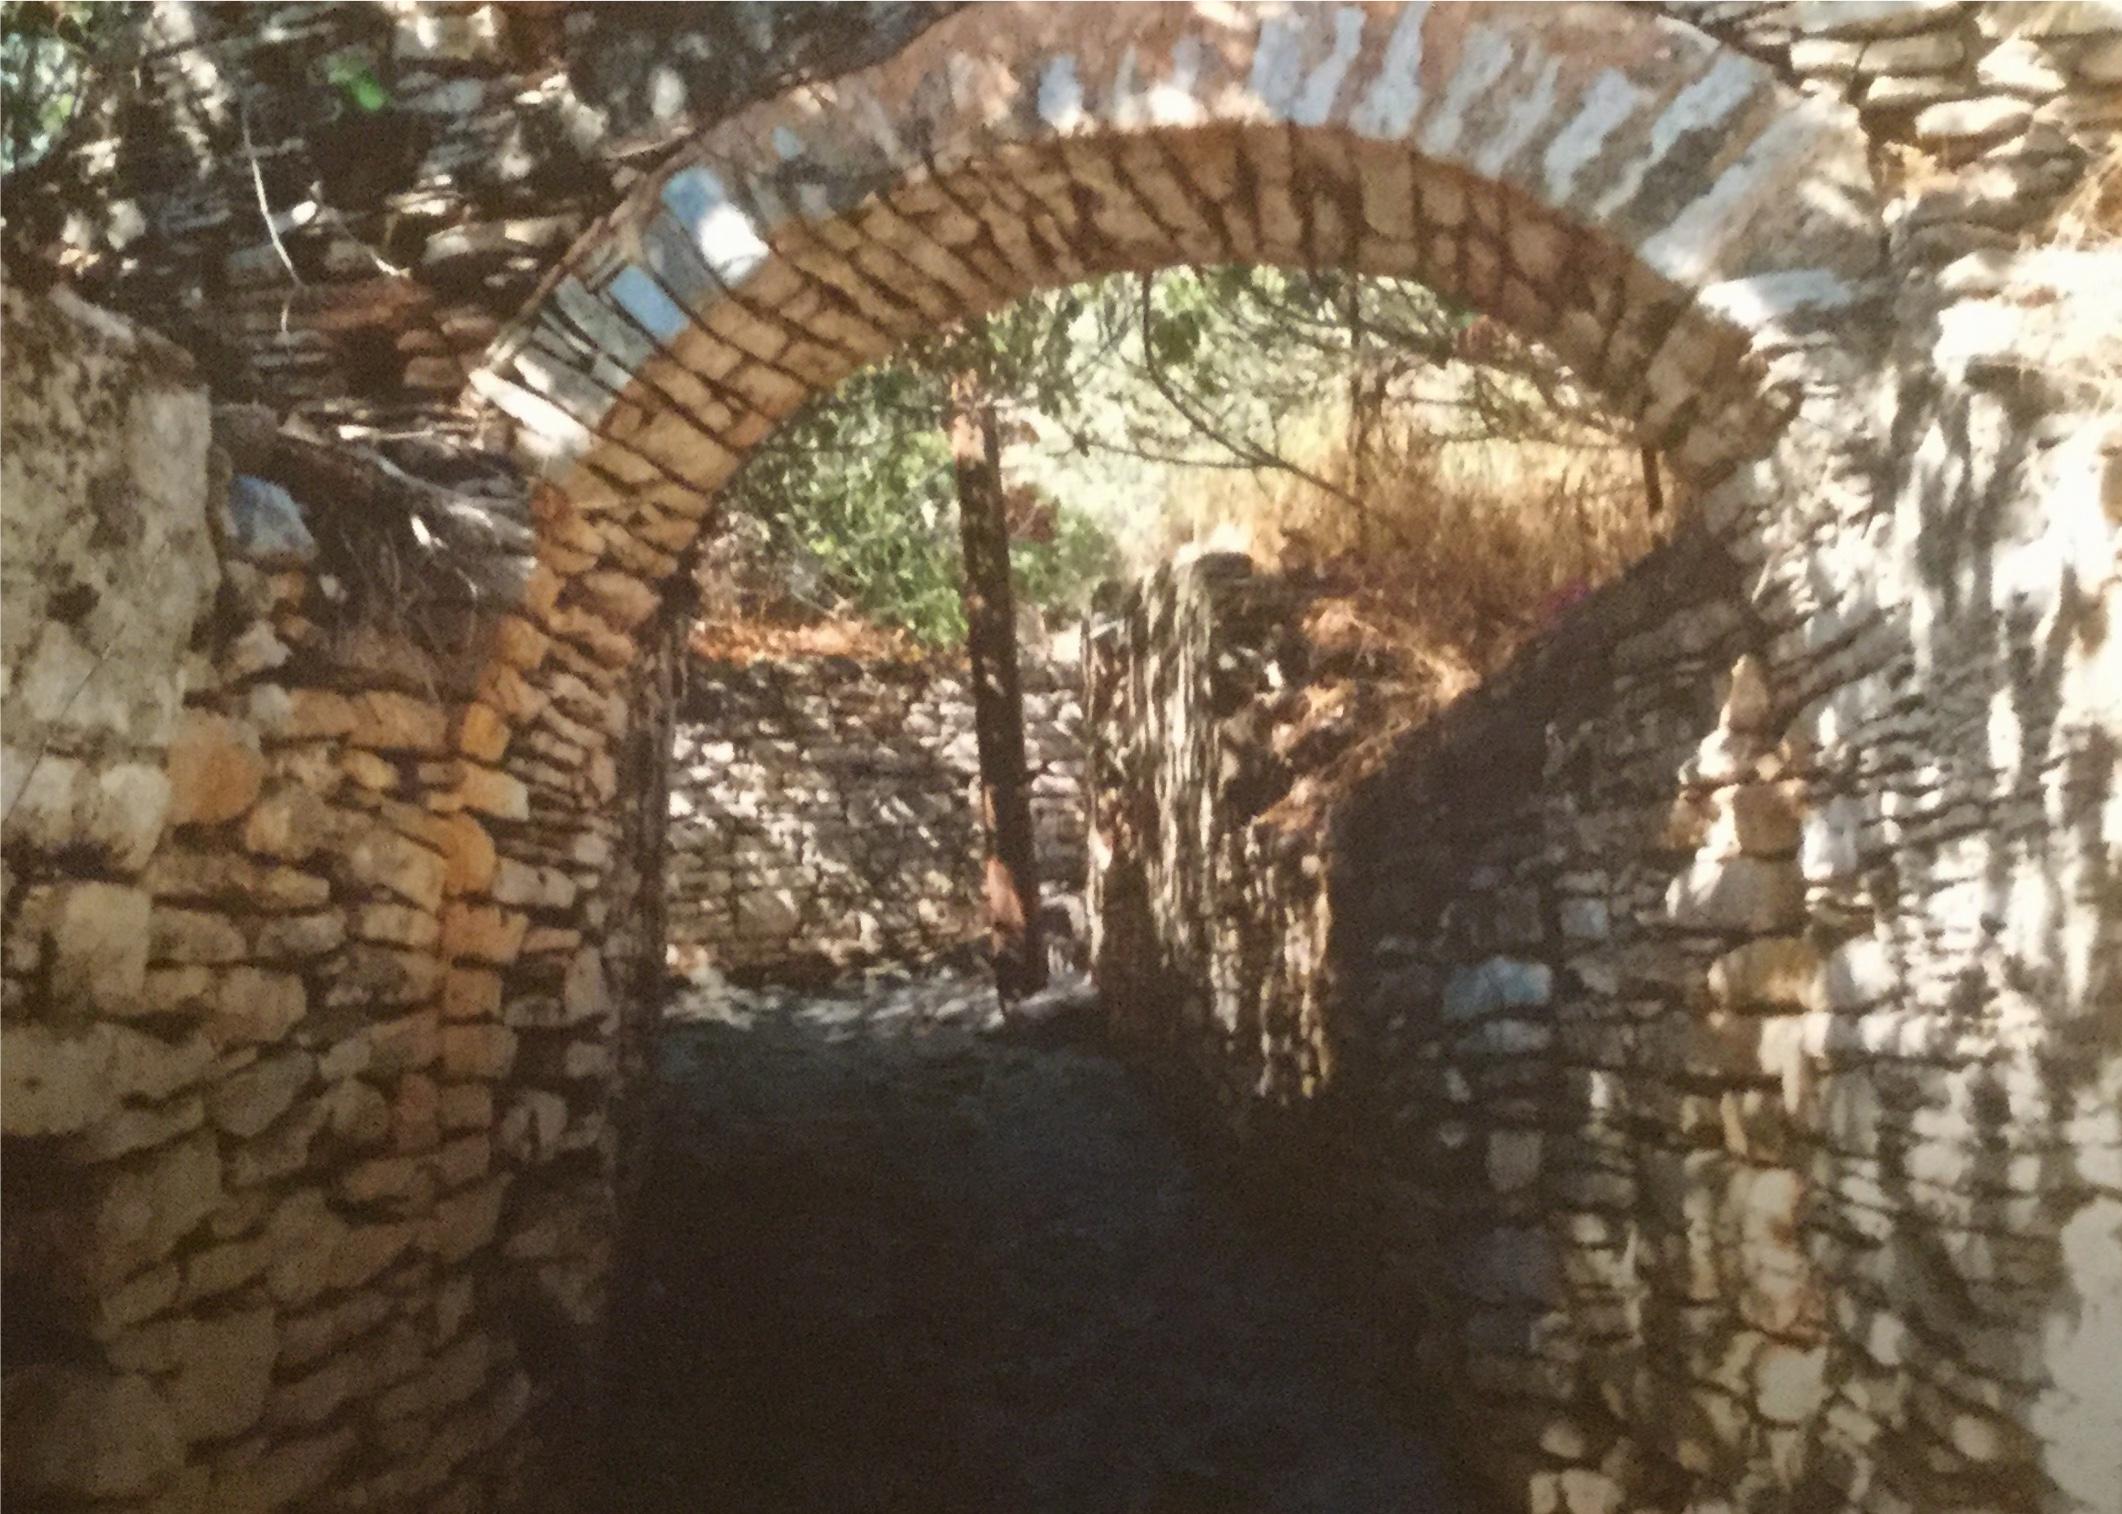 Thr ruins in the building in Pansaers.